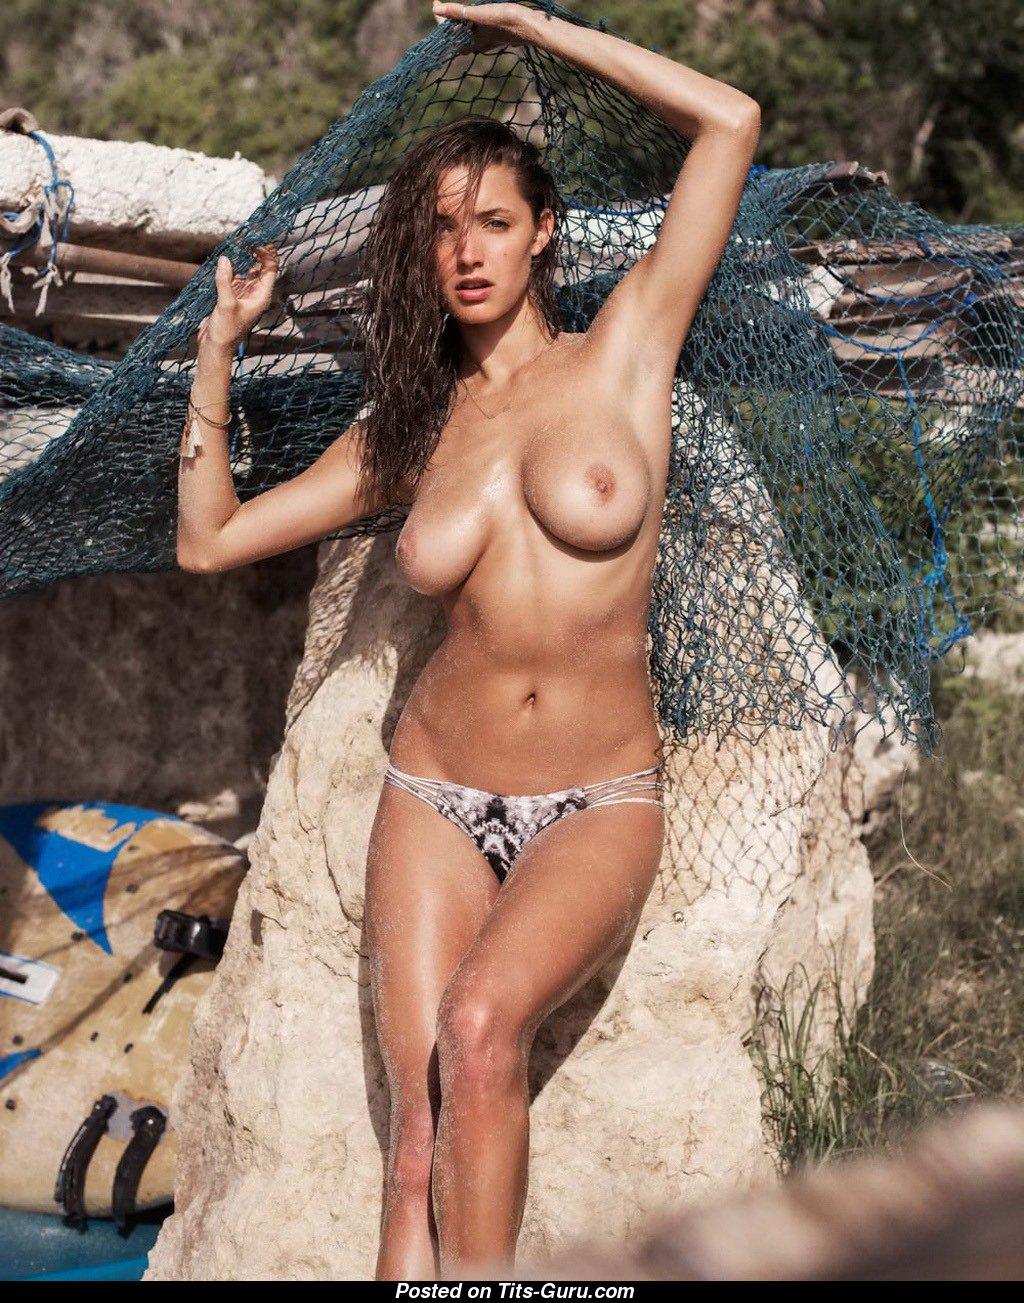 Alyssa Arce Nude Pics alyssa arce - latina doll with nude natural soft melons